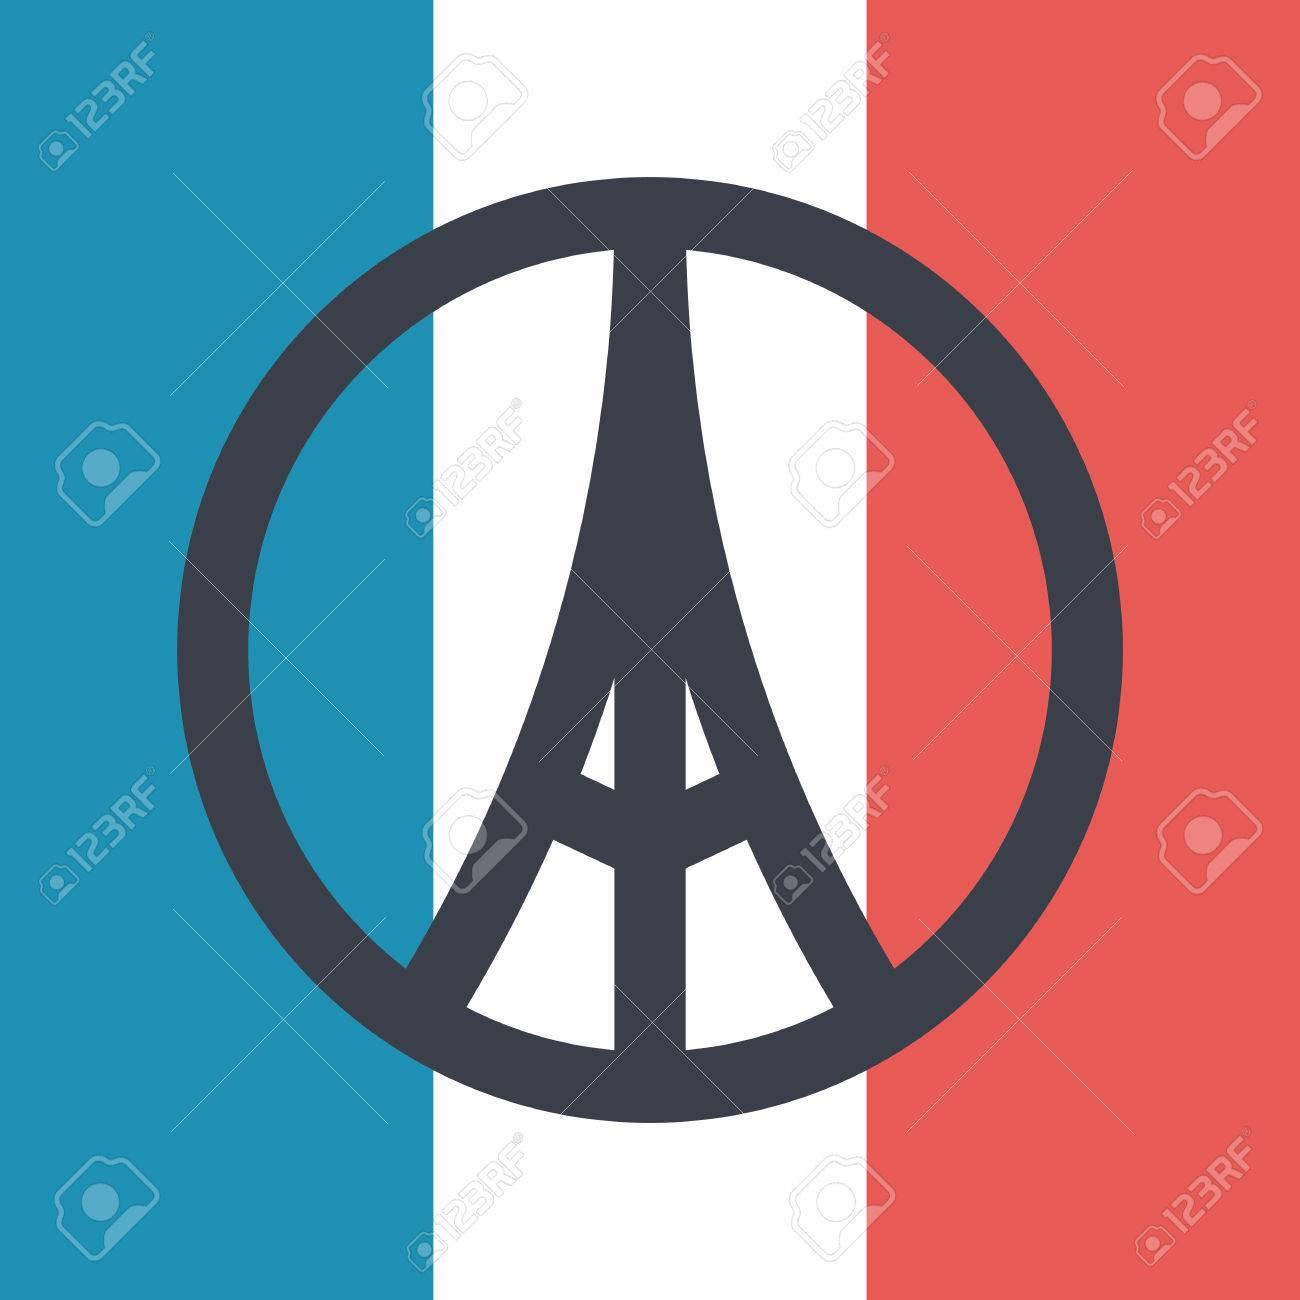 Pray for paris symbol on france flag background peace for paris pray for paris symbol on france flag background peace for paris concept vector illustration biocorpaavc